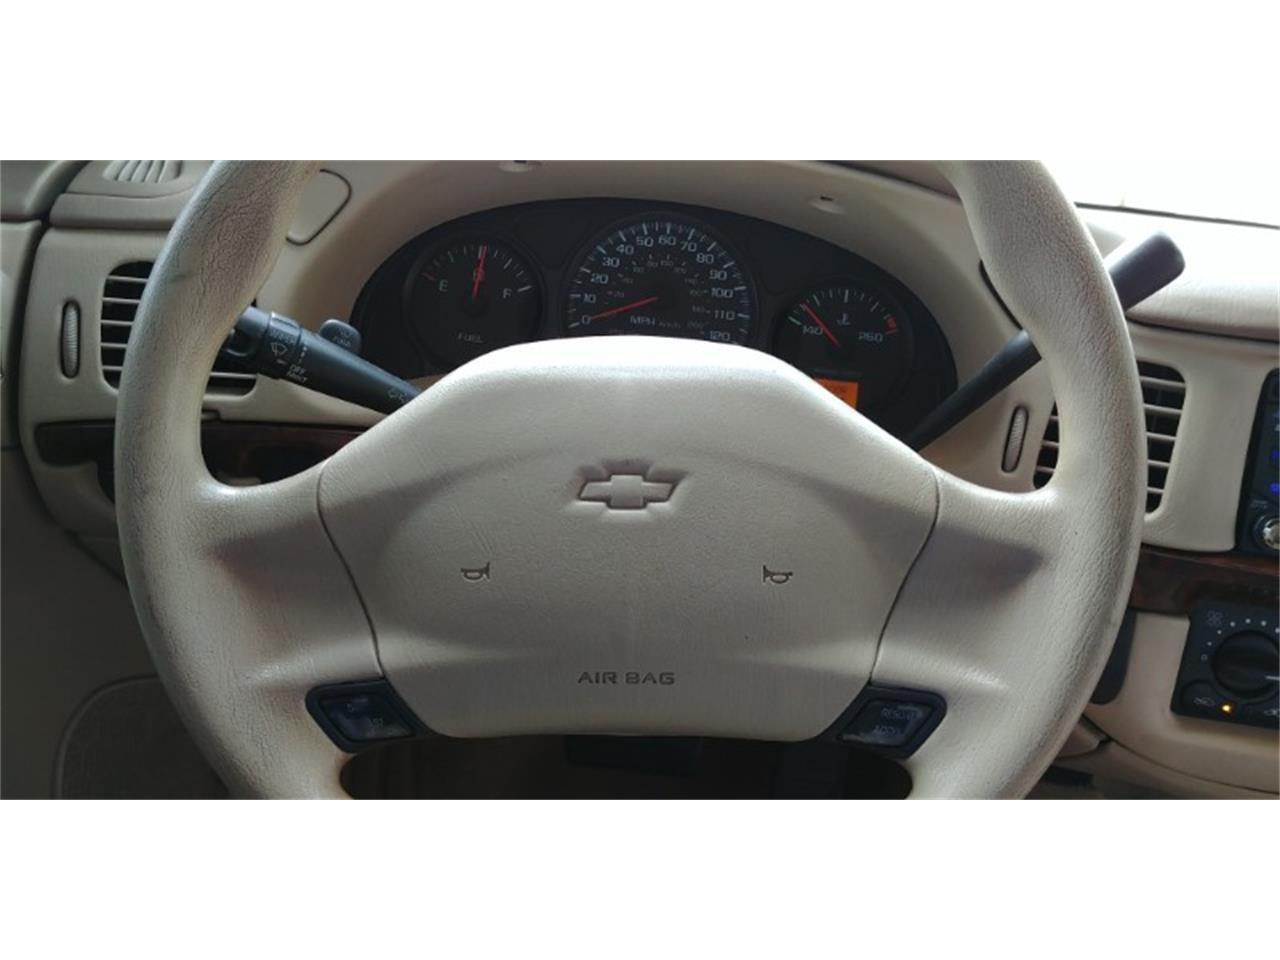 2004 Chevrolet Impala (CC-1207083) for sale in Tavares, Florida